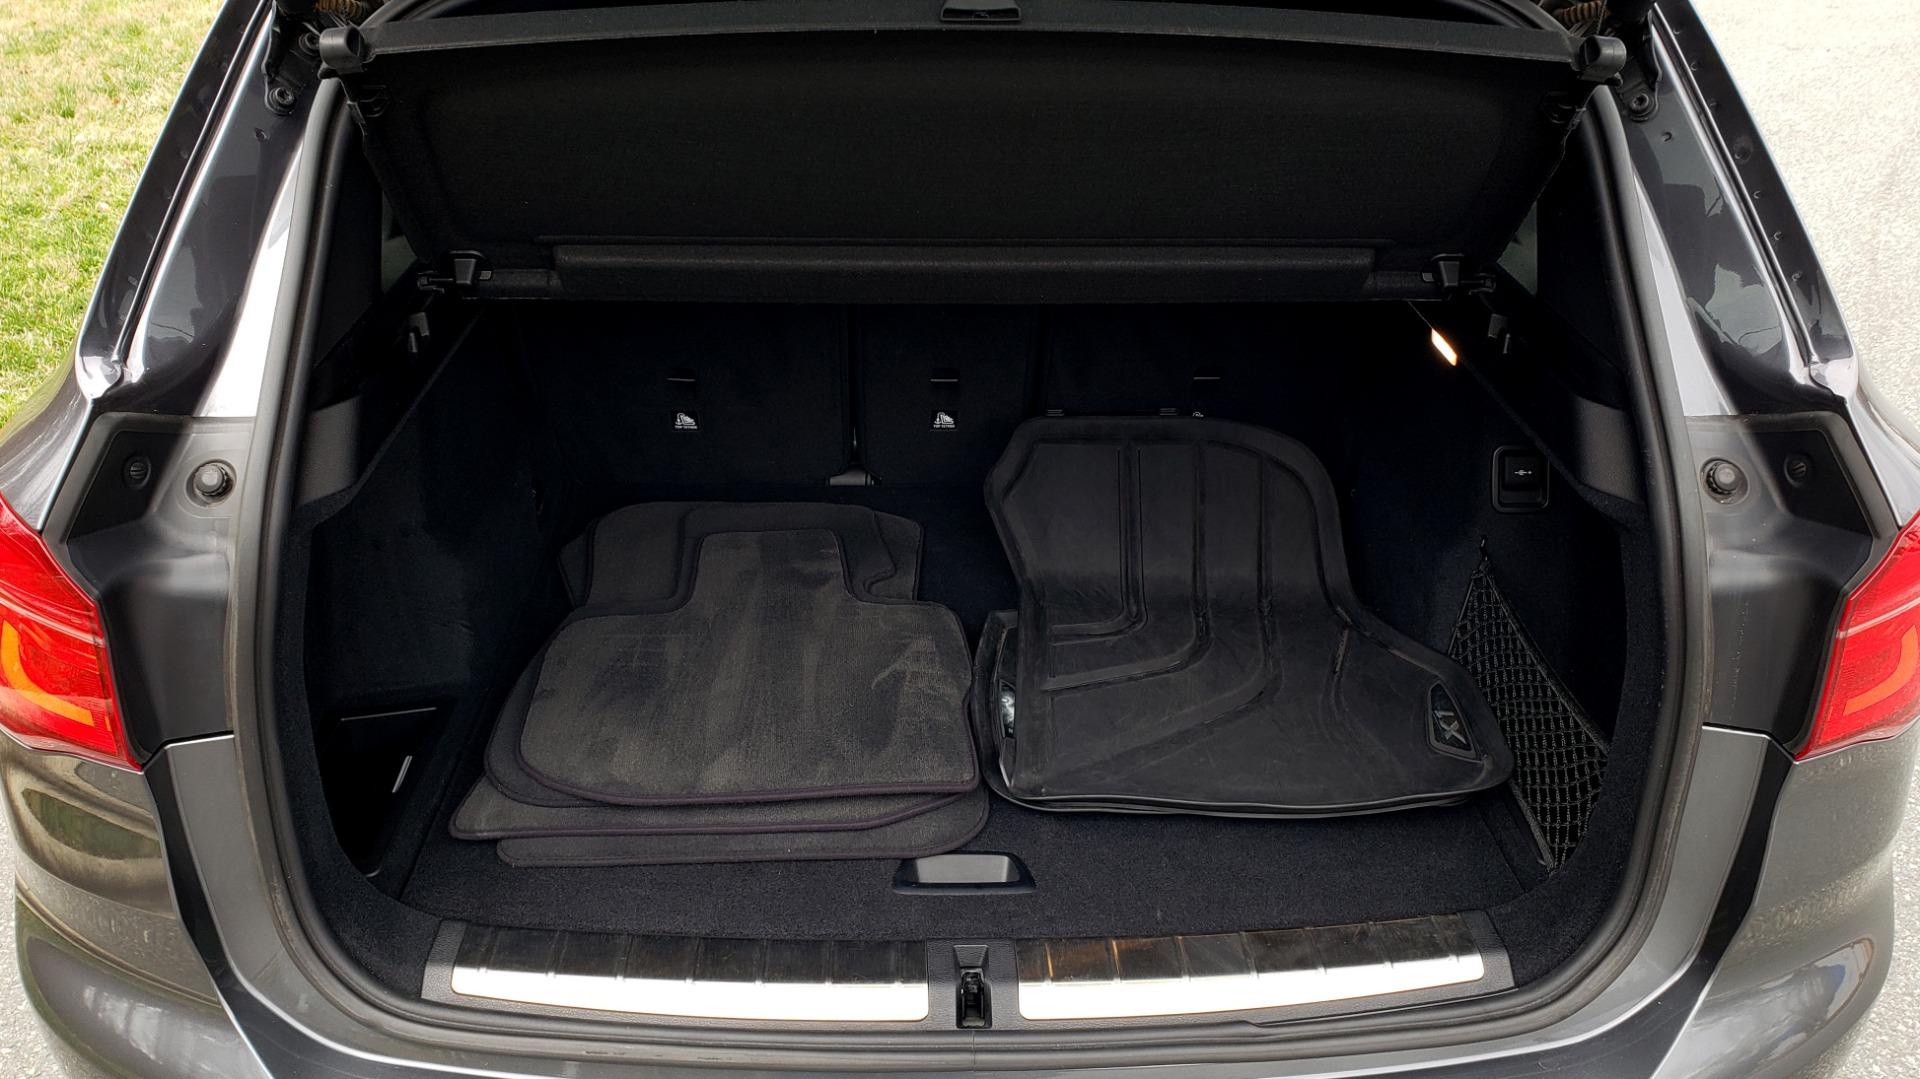 Used 2017 BMW X1 XDRIVE28I / PREM PKG / DRIVER ASST / NAV / CLD WTHR for sale Sold at Formula Imports in Charlotte NC 28227 14